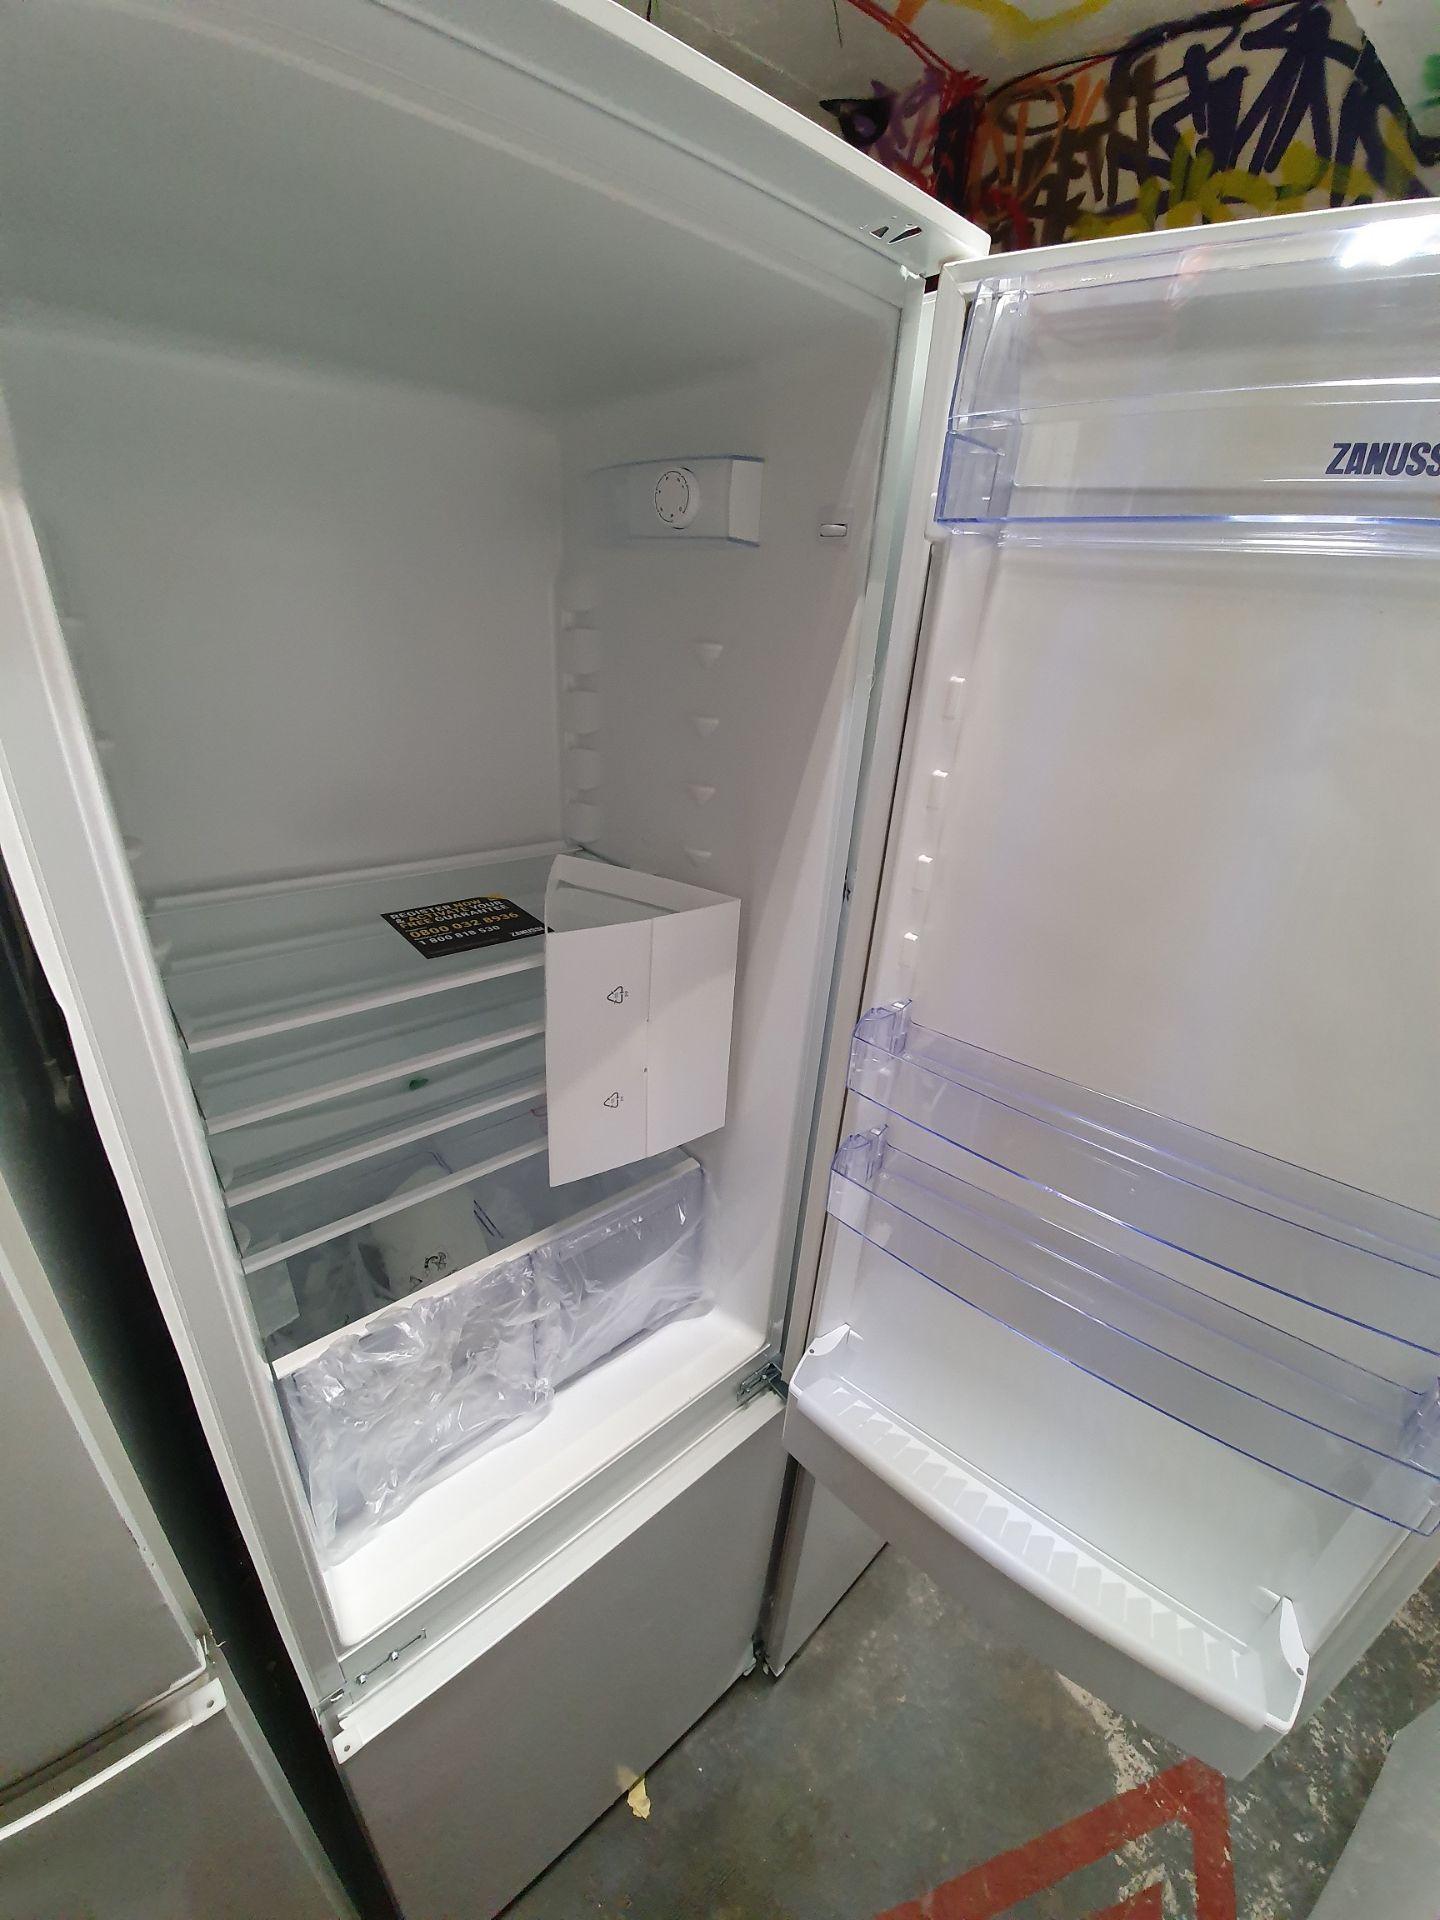 NEW/GRADED AND PACKAGED Zanussi ZBB28441SV Integrated 70/30 Fridge Freezer (Slight external damage) - Image 9 of 14